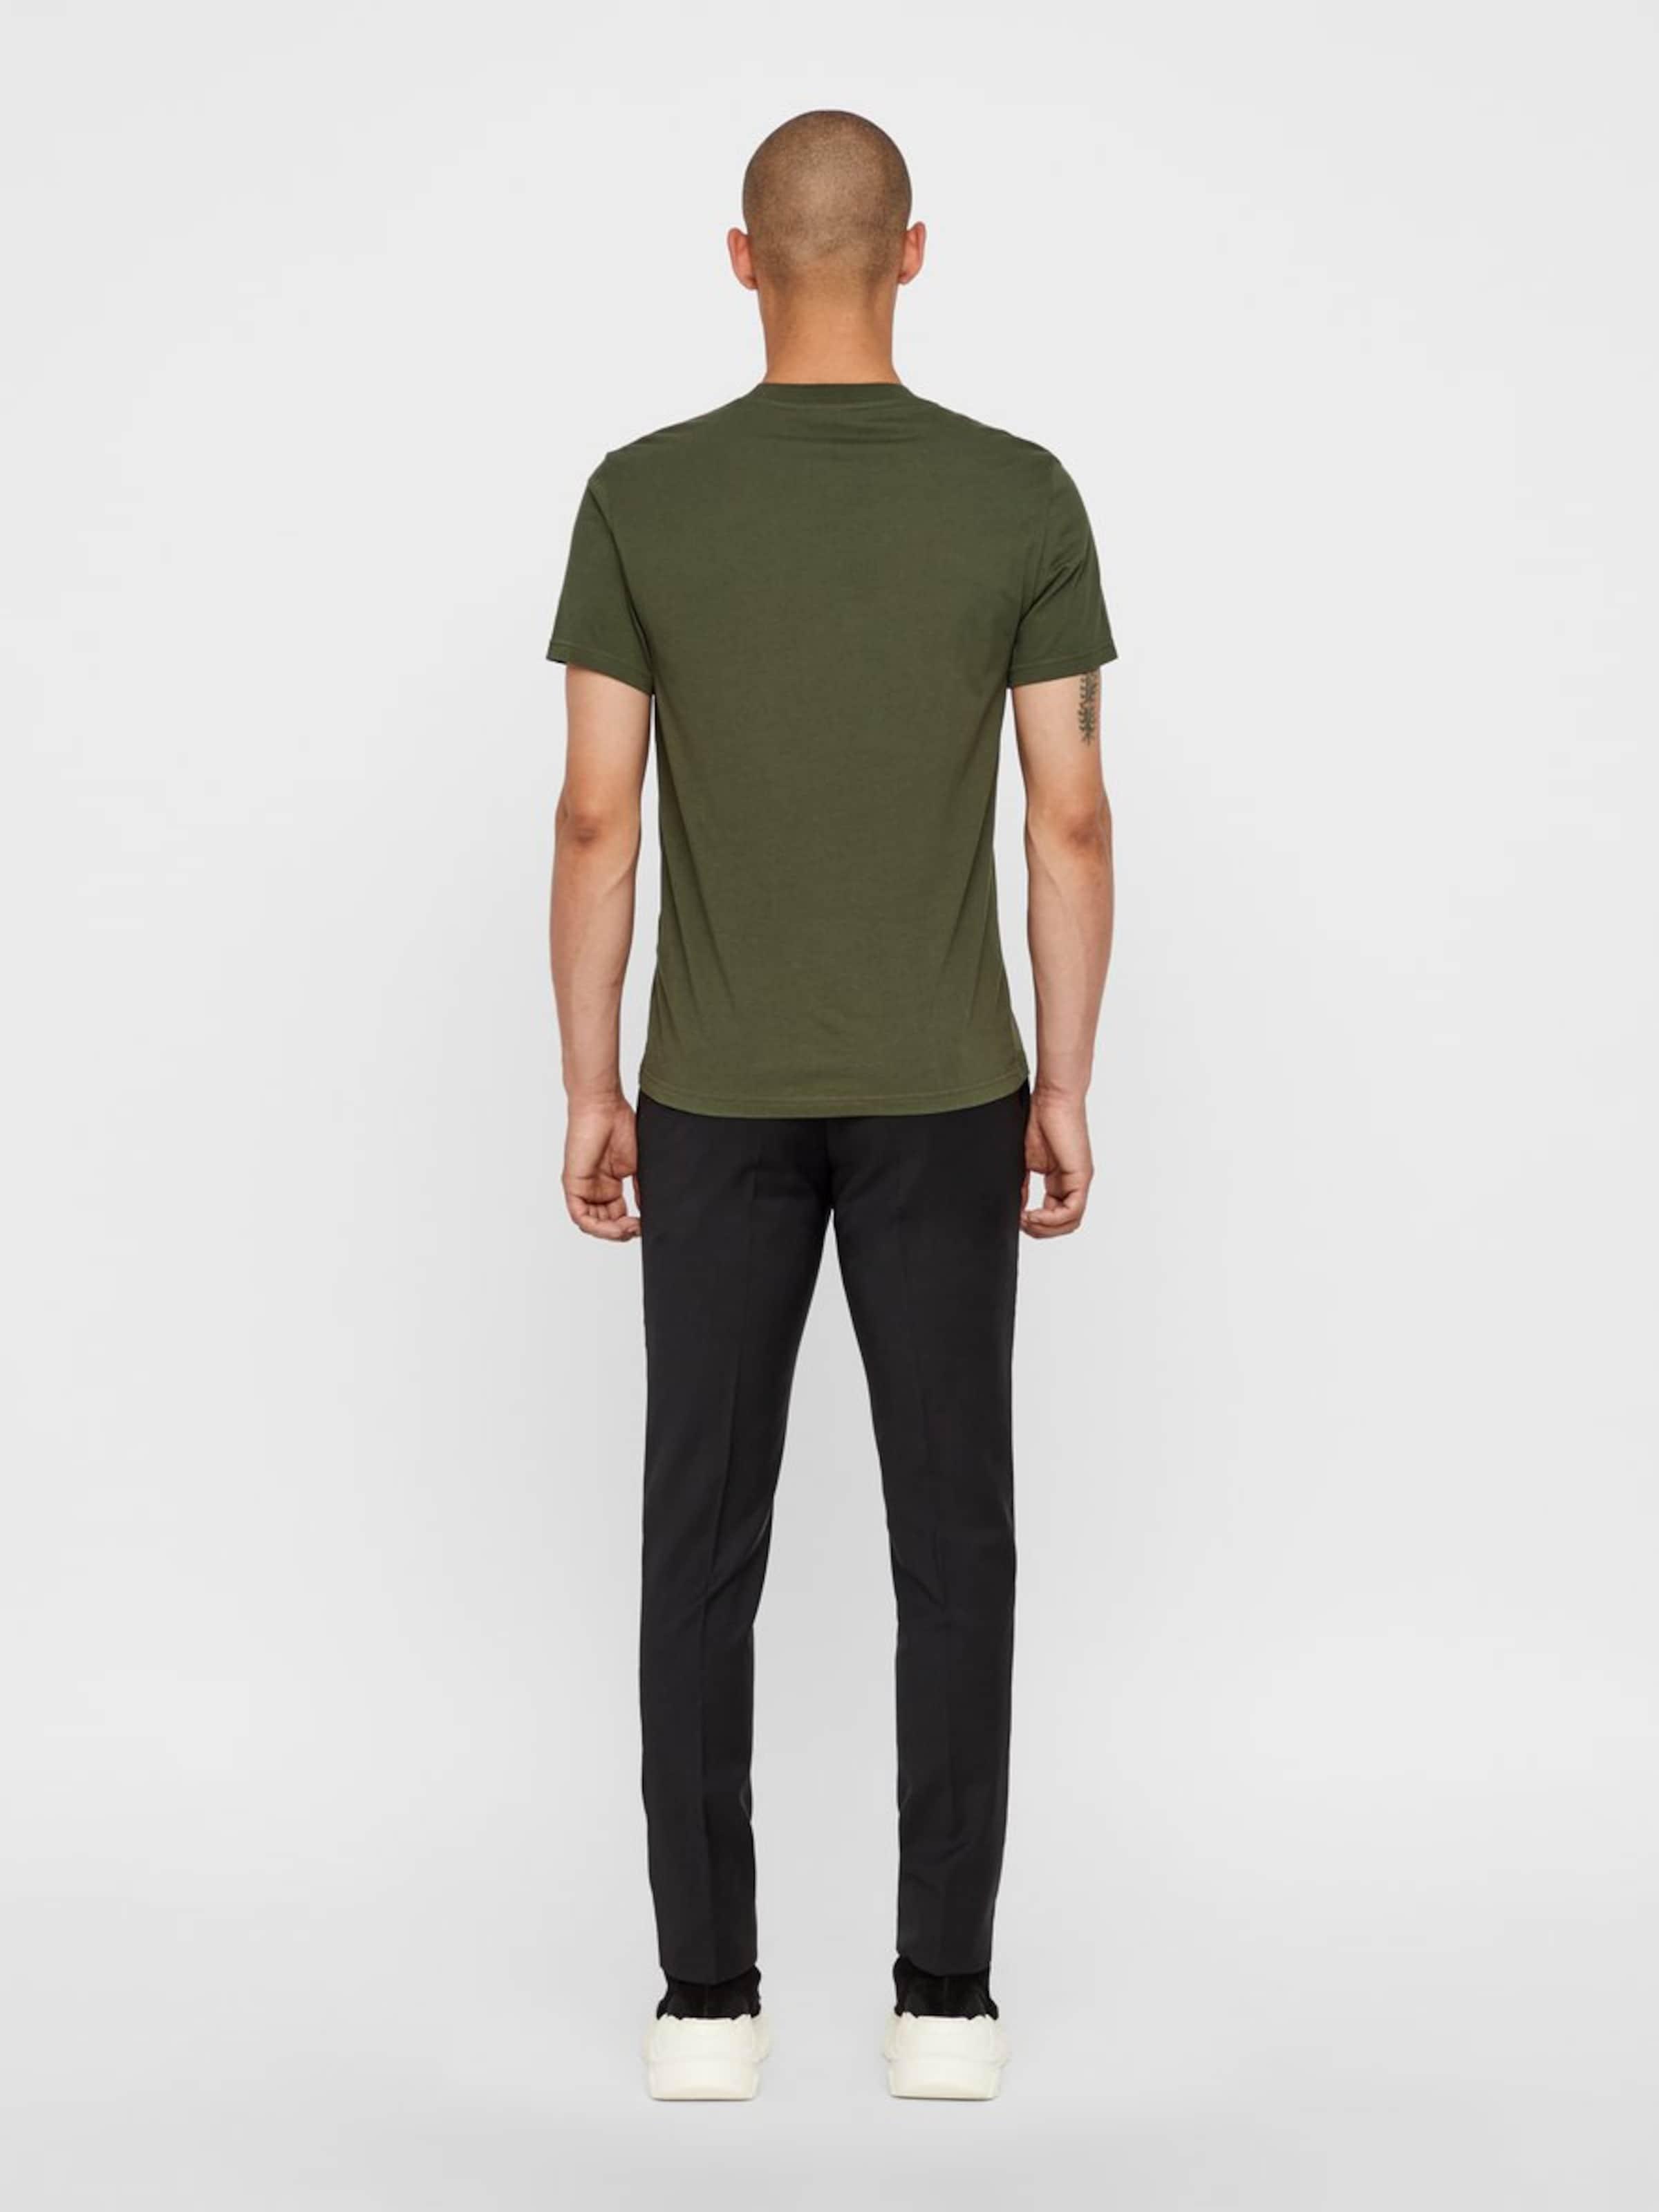 J T shirt lindeberg 'silo' En Vert Gazon MLjzqSUVpG